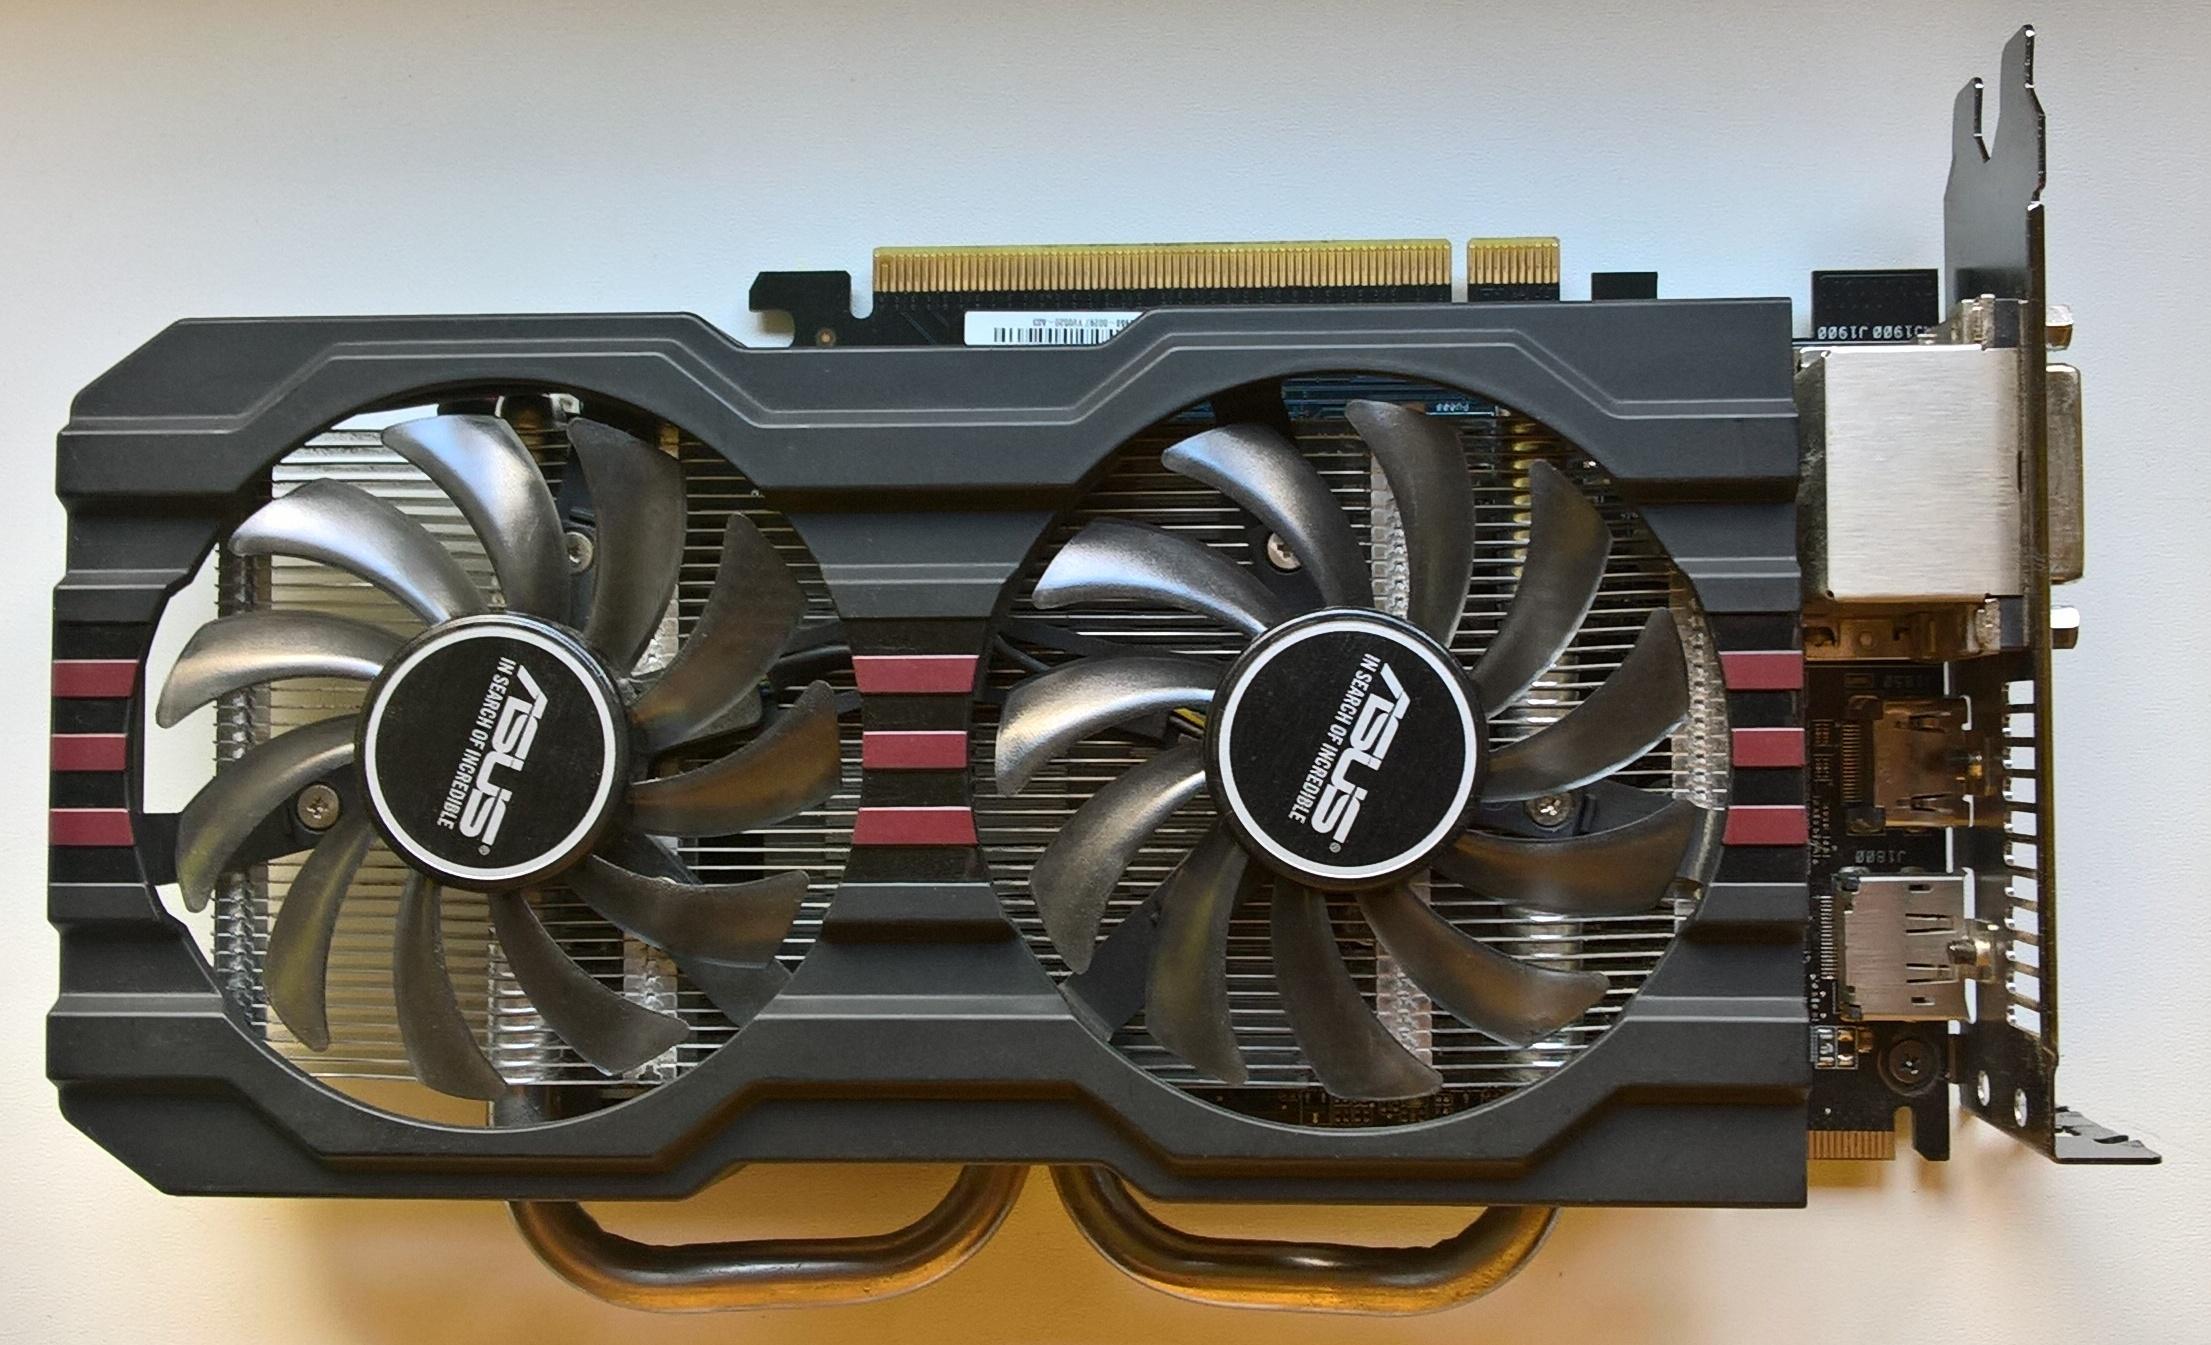 ASUS Radeon R7 260X 2GB GDDR5 - 7088324060 - oficjalne